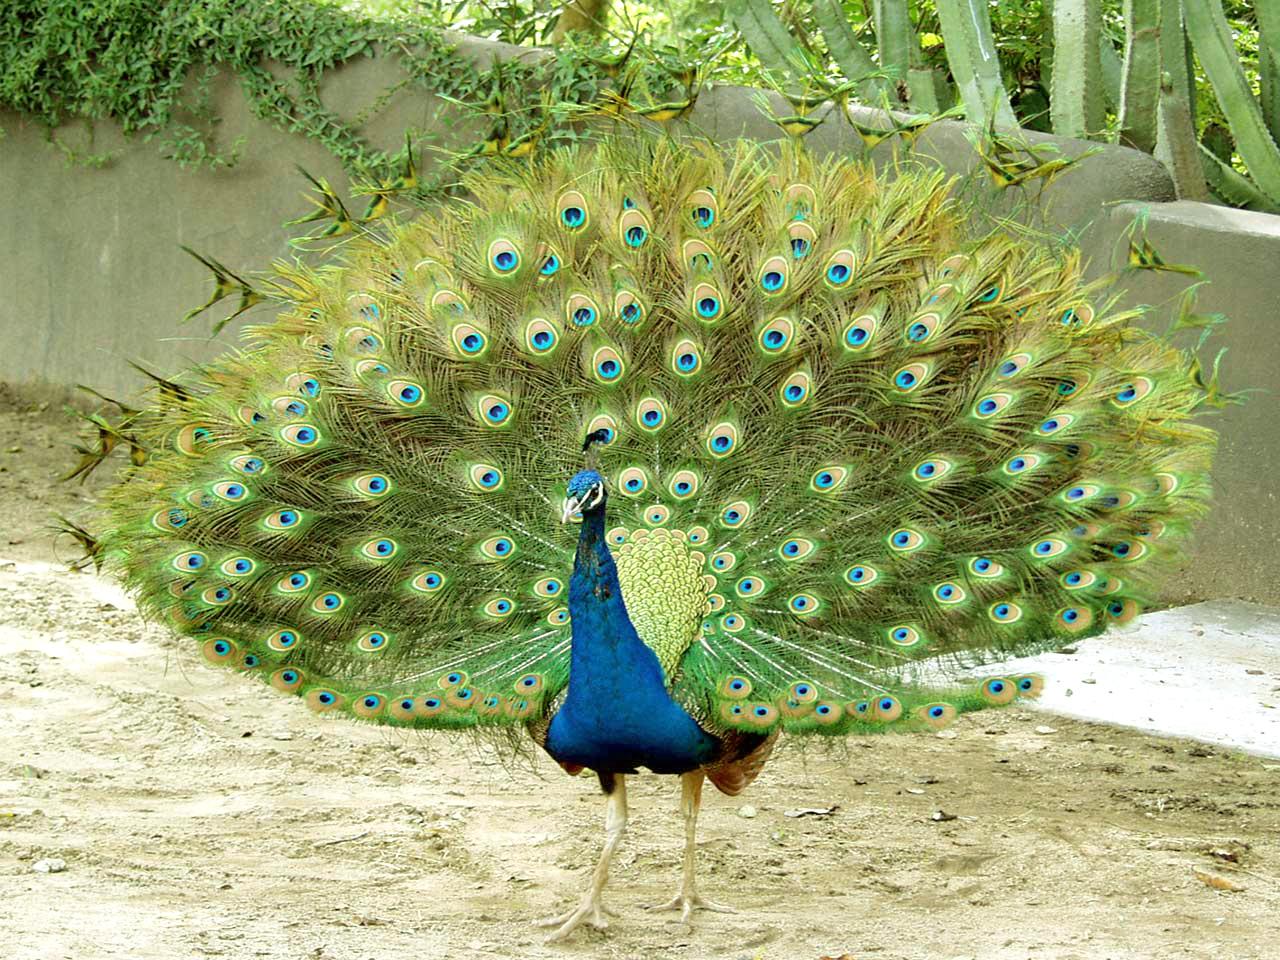 Beautiful Peacock Wallpapers Hd